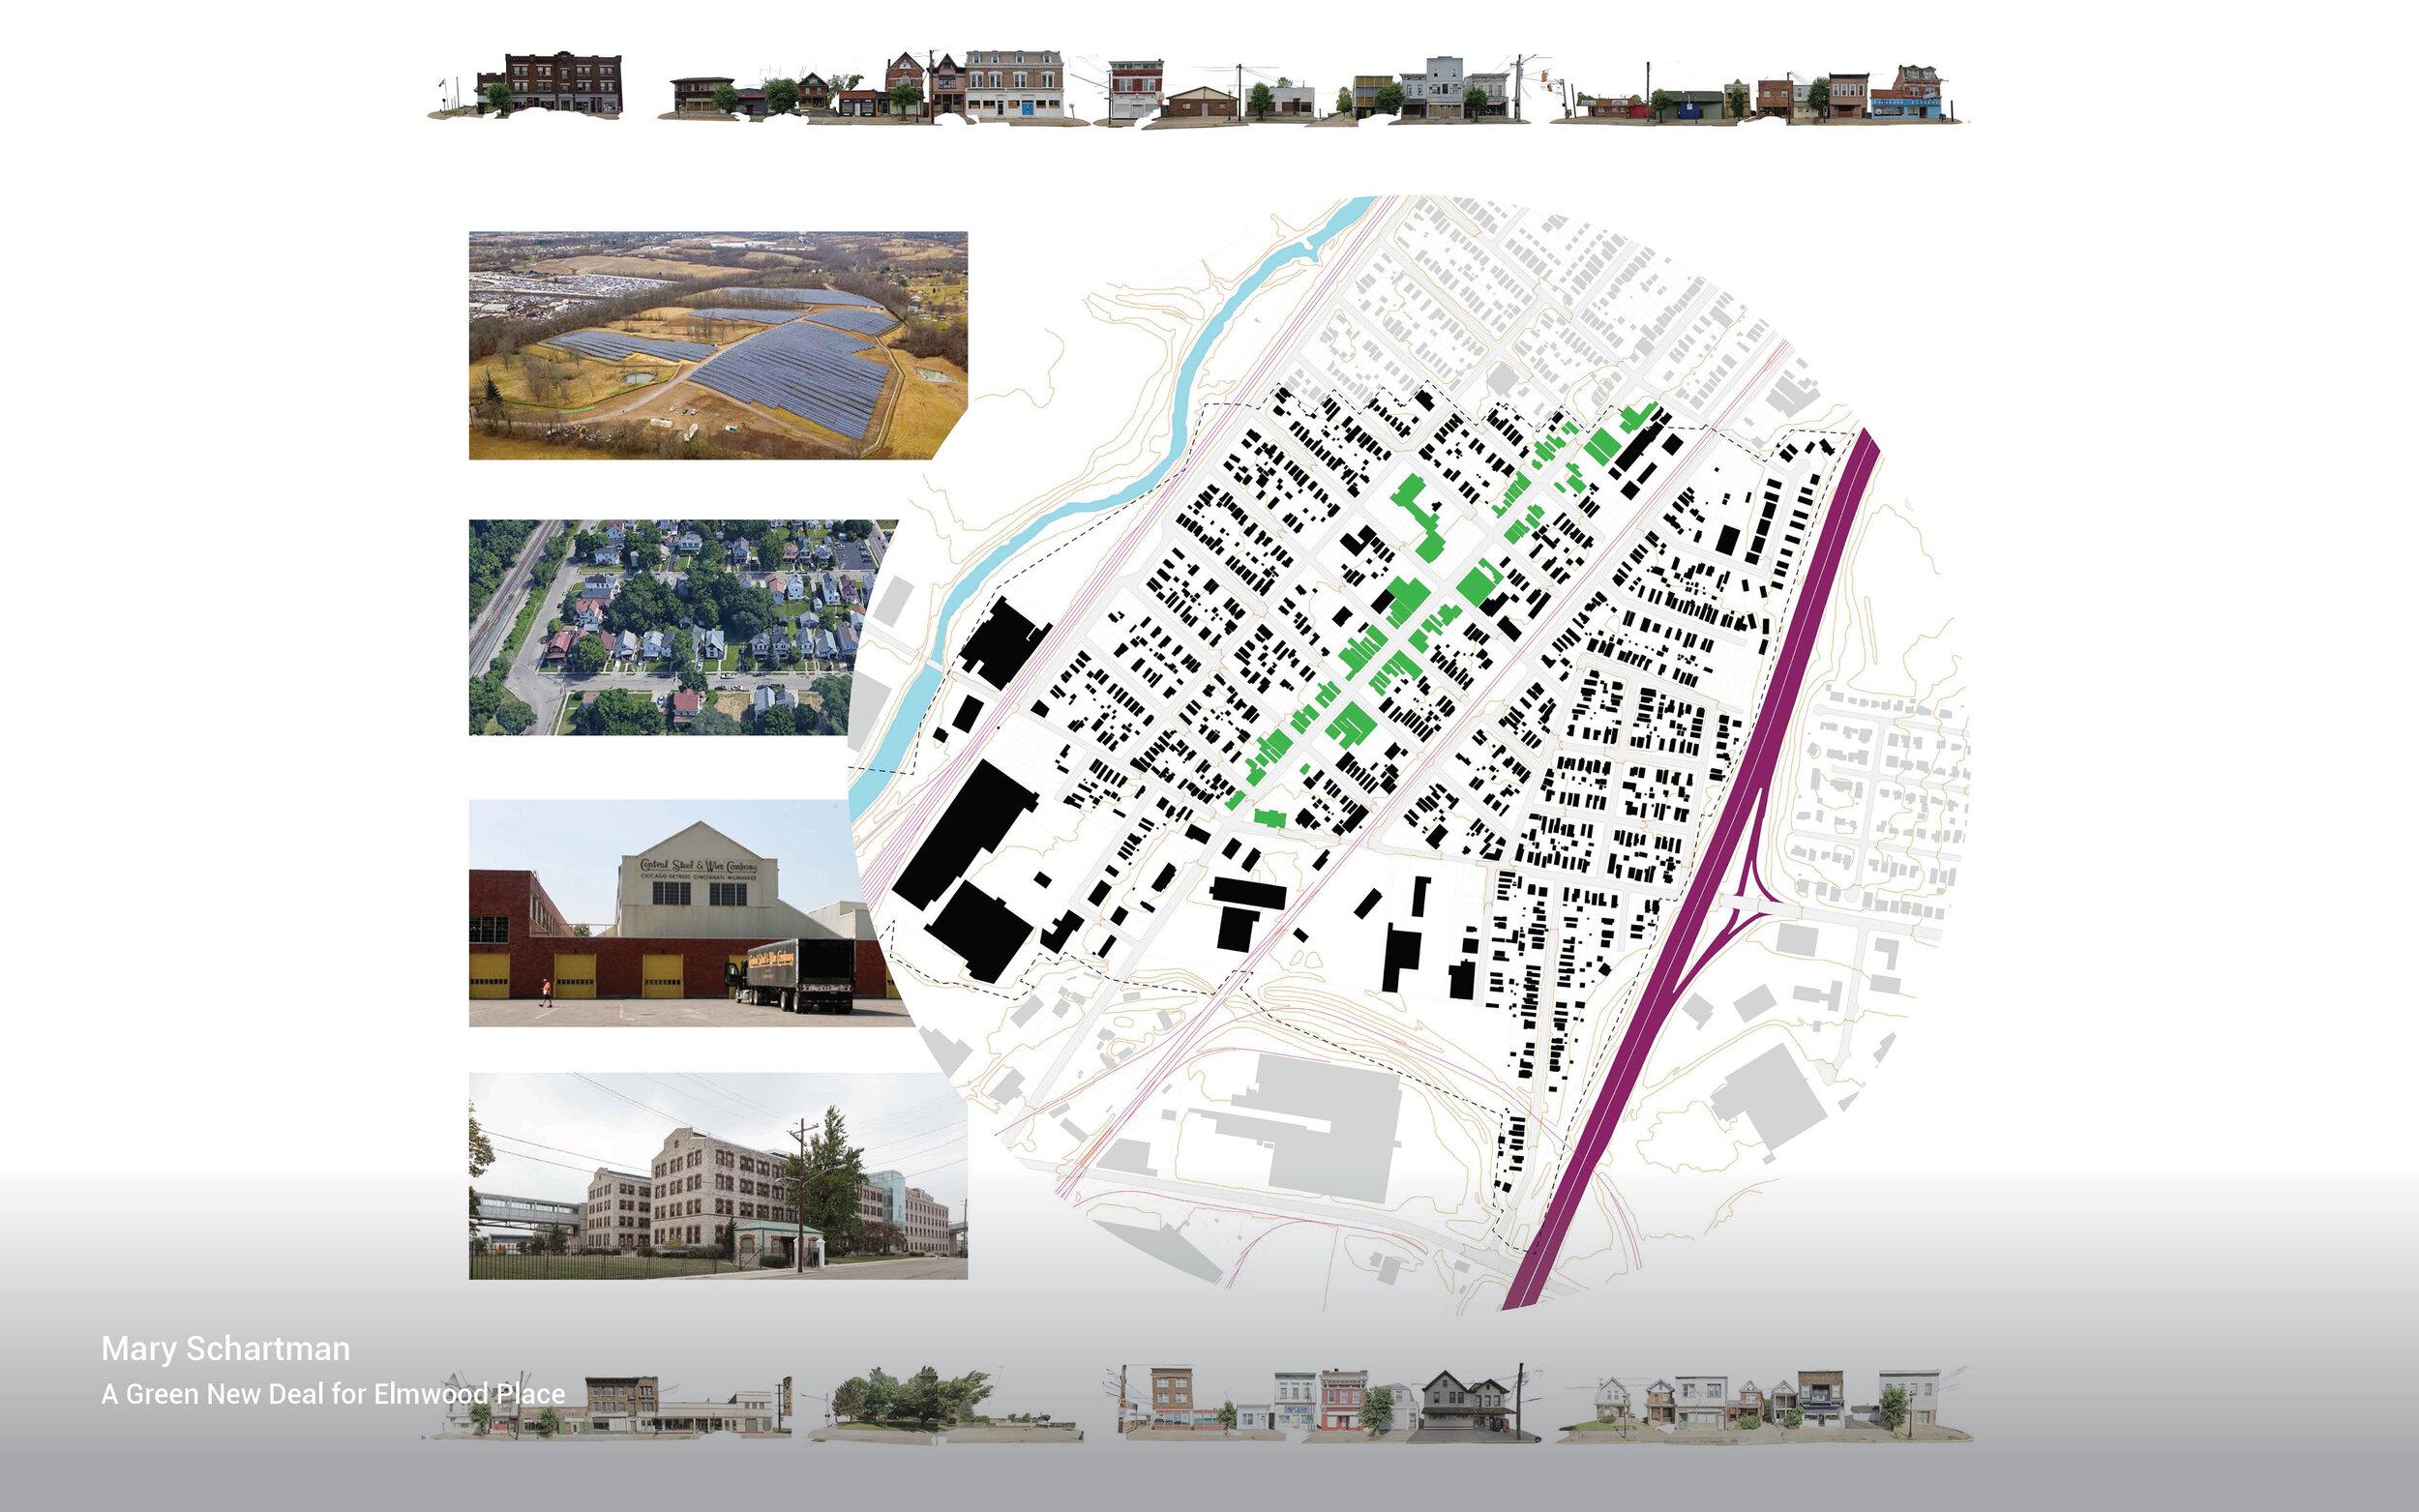 Mary Schartman_A Green New Deal for Elmwood Place_2.jpg